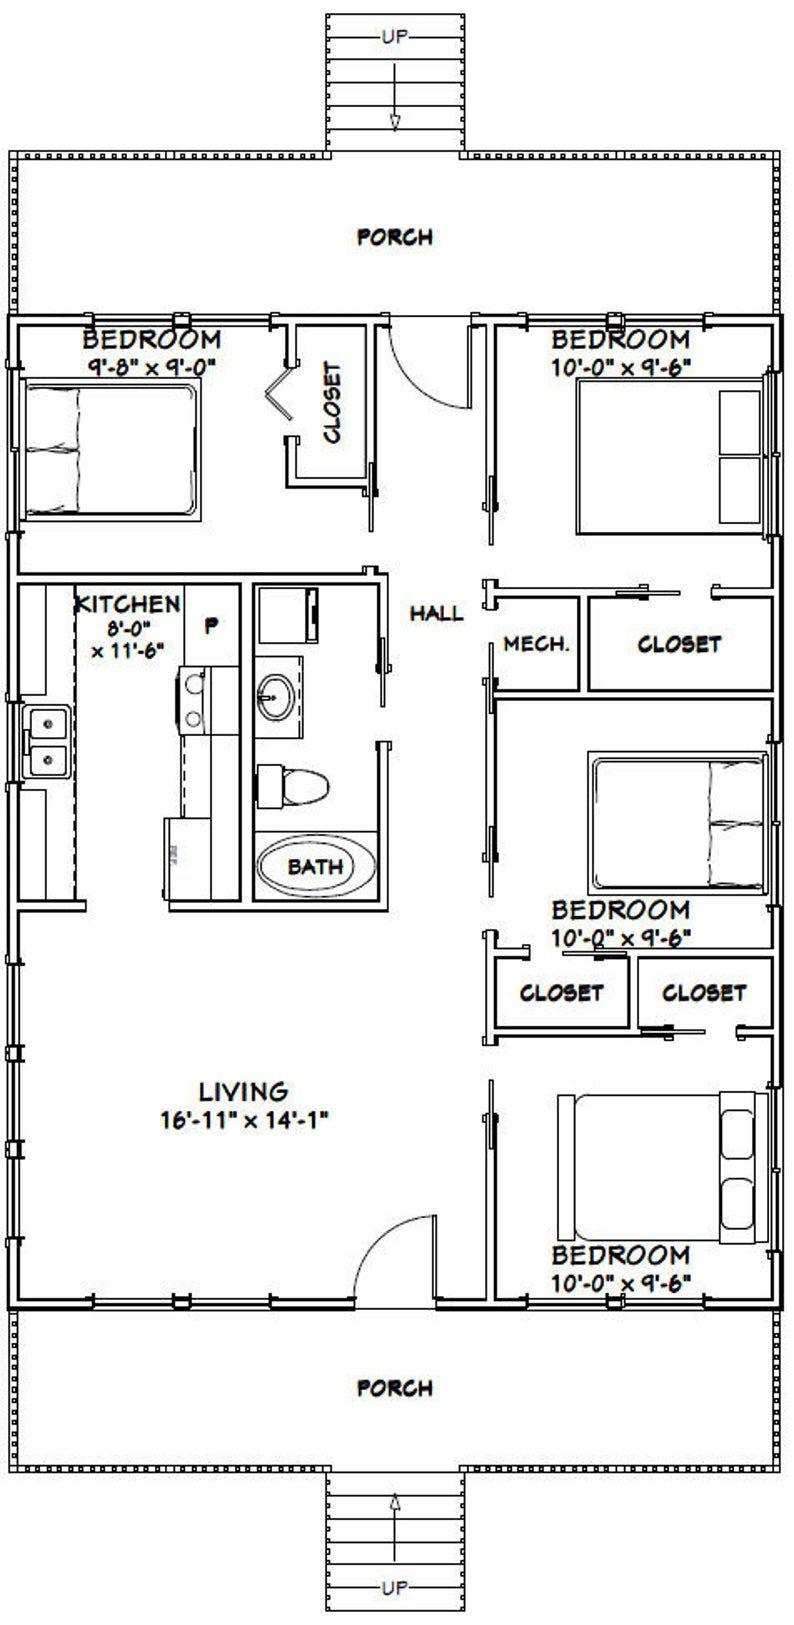 28x36 House 4Bedroom 1Bath 1008 sq ft PDF Floor Etsy